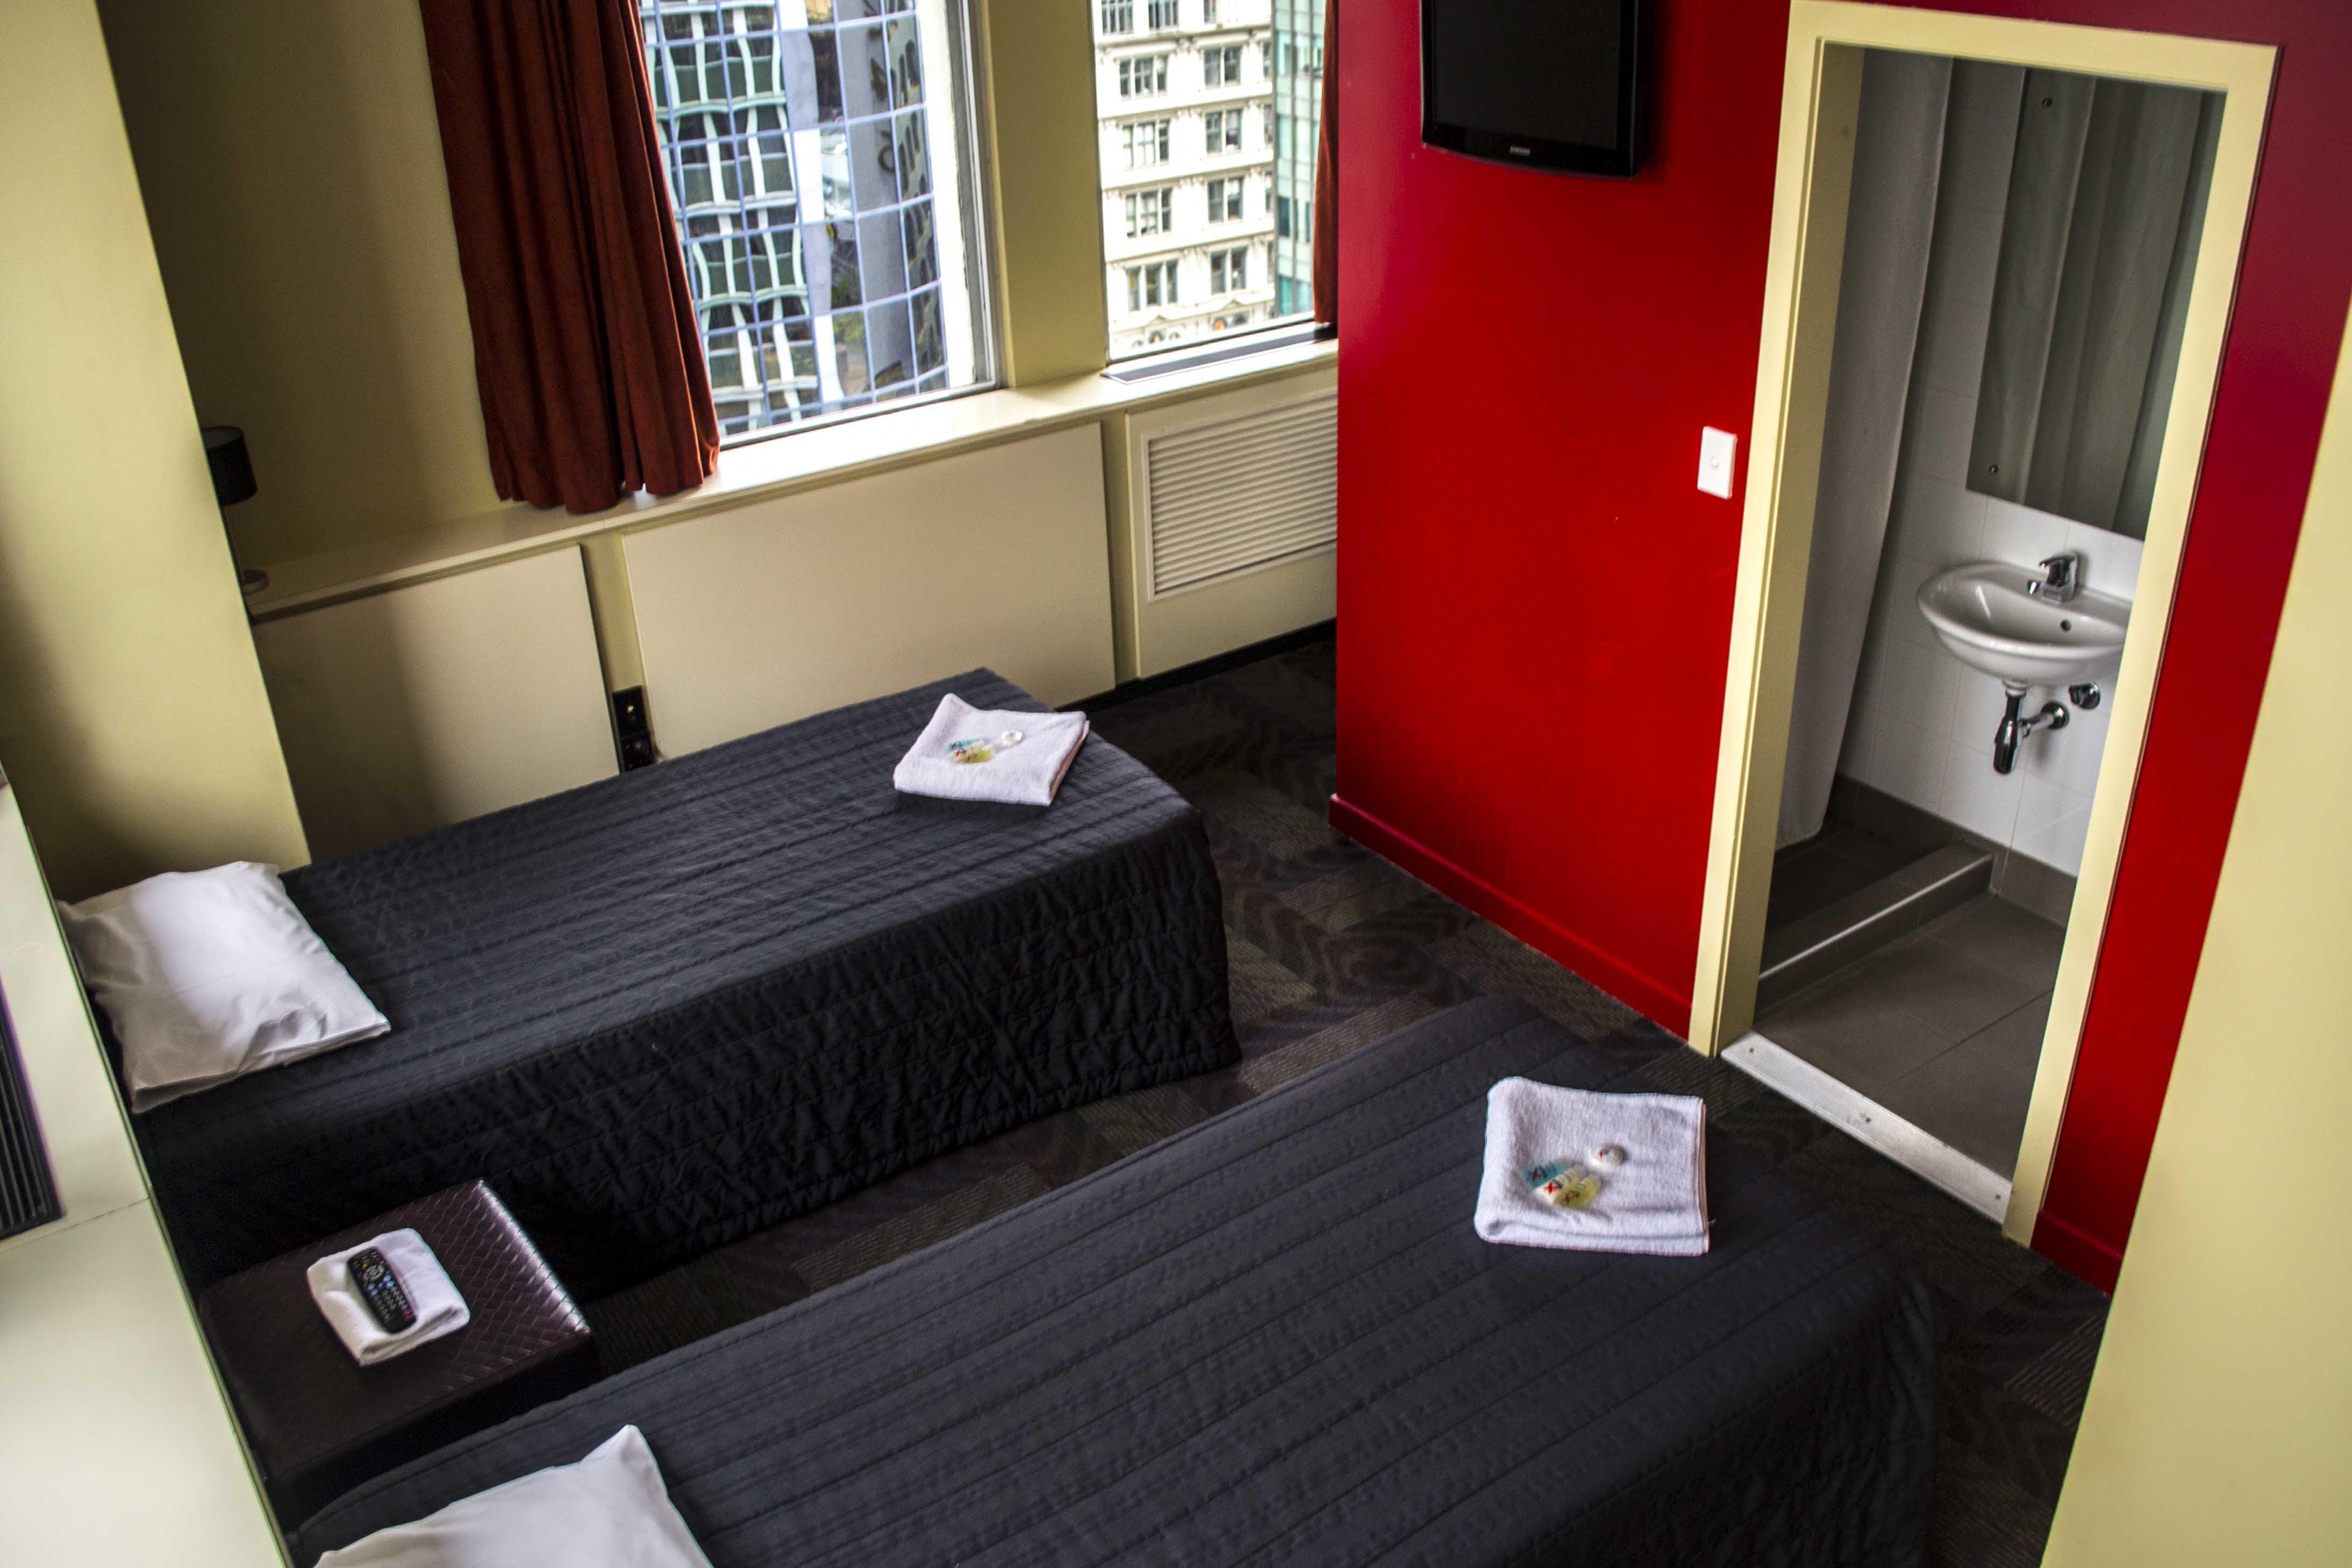 Base奥克兰背包客旅馆的私人双床套房